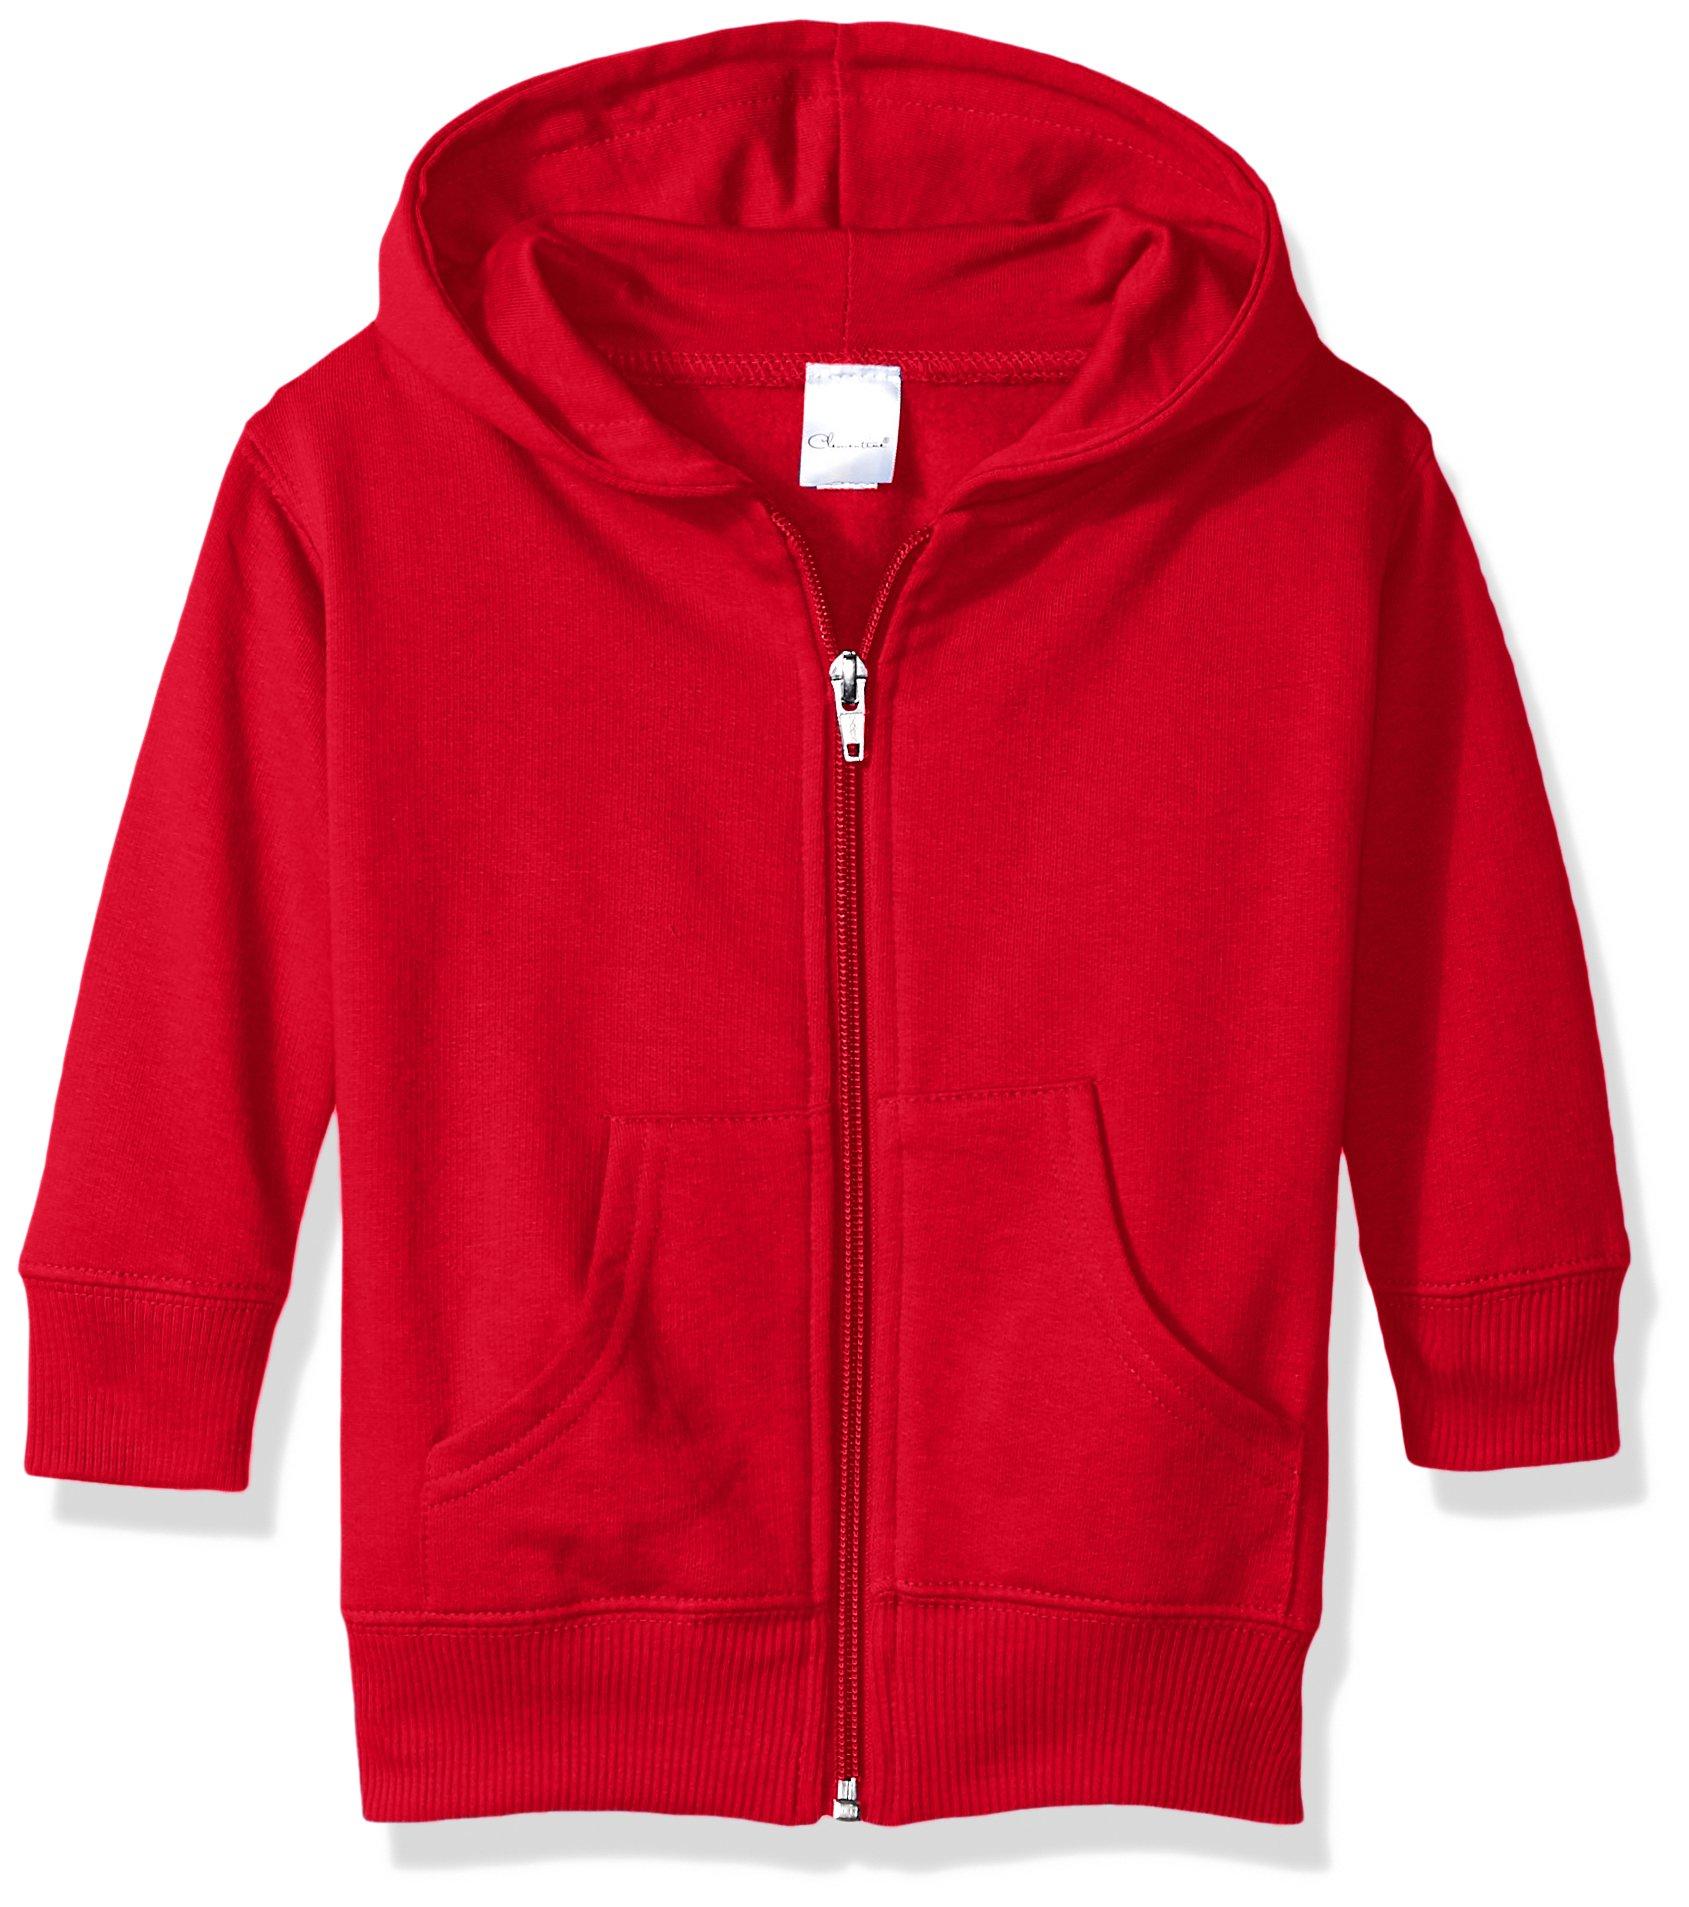 Clementine Baby Infant Premium Fleece Zip Sweatshirt Hoodie, RED, 12MOS by Clementine